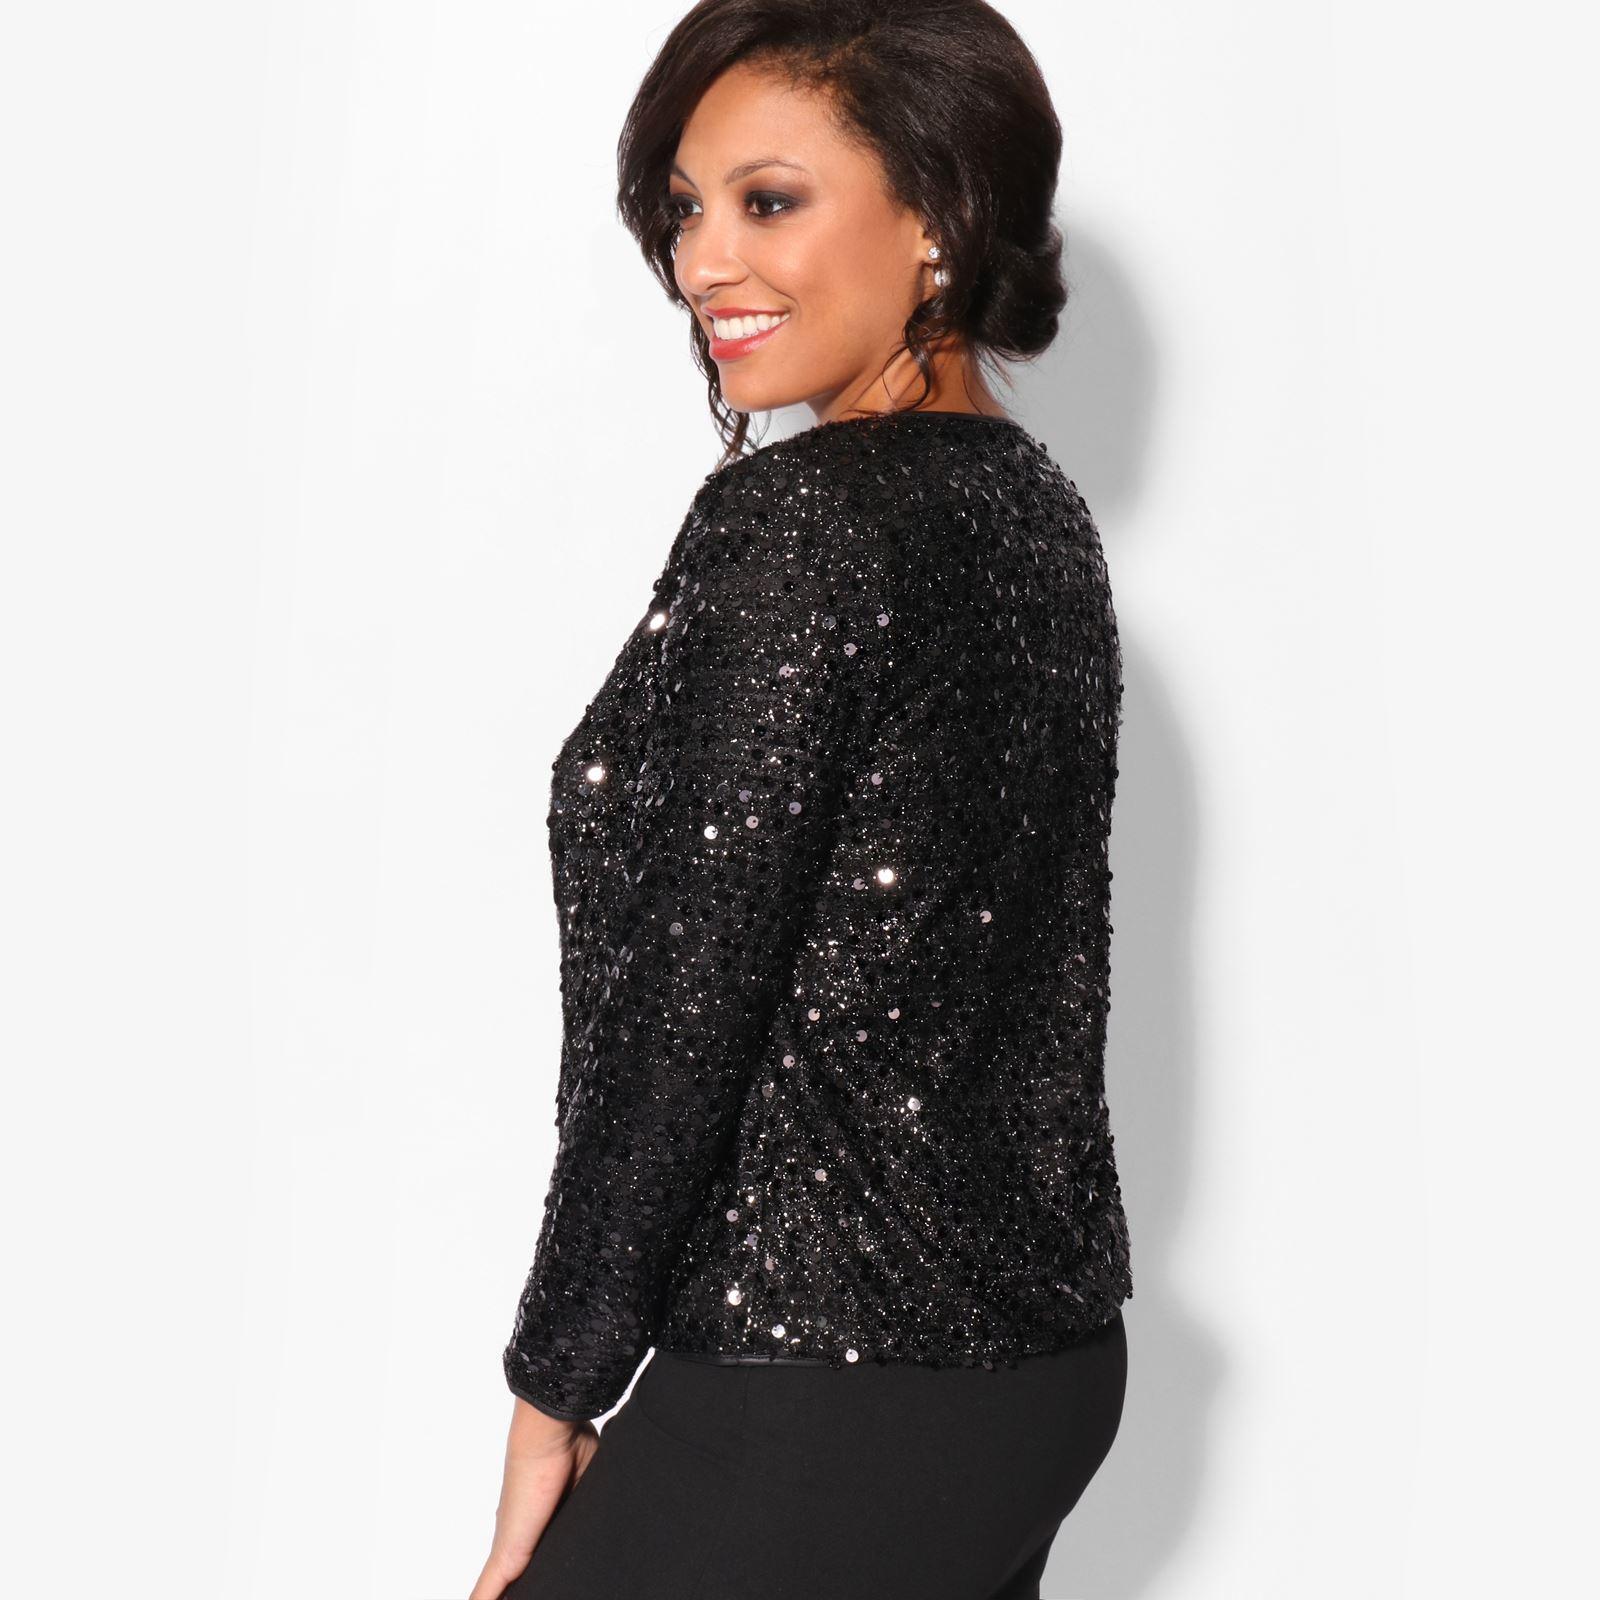 New Womens Sequin ¾ Sleeve Shrug Bolero Cropped Top  Jacket Blazer Party Evening